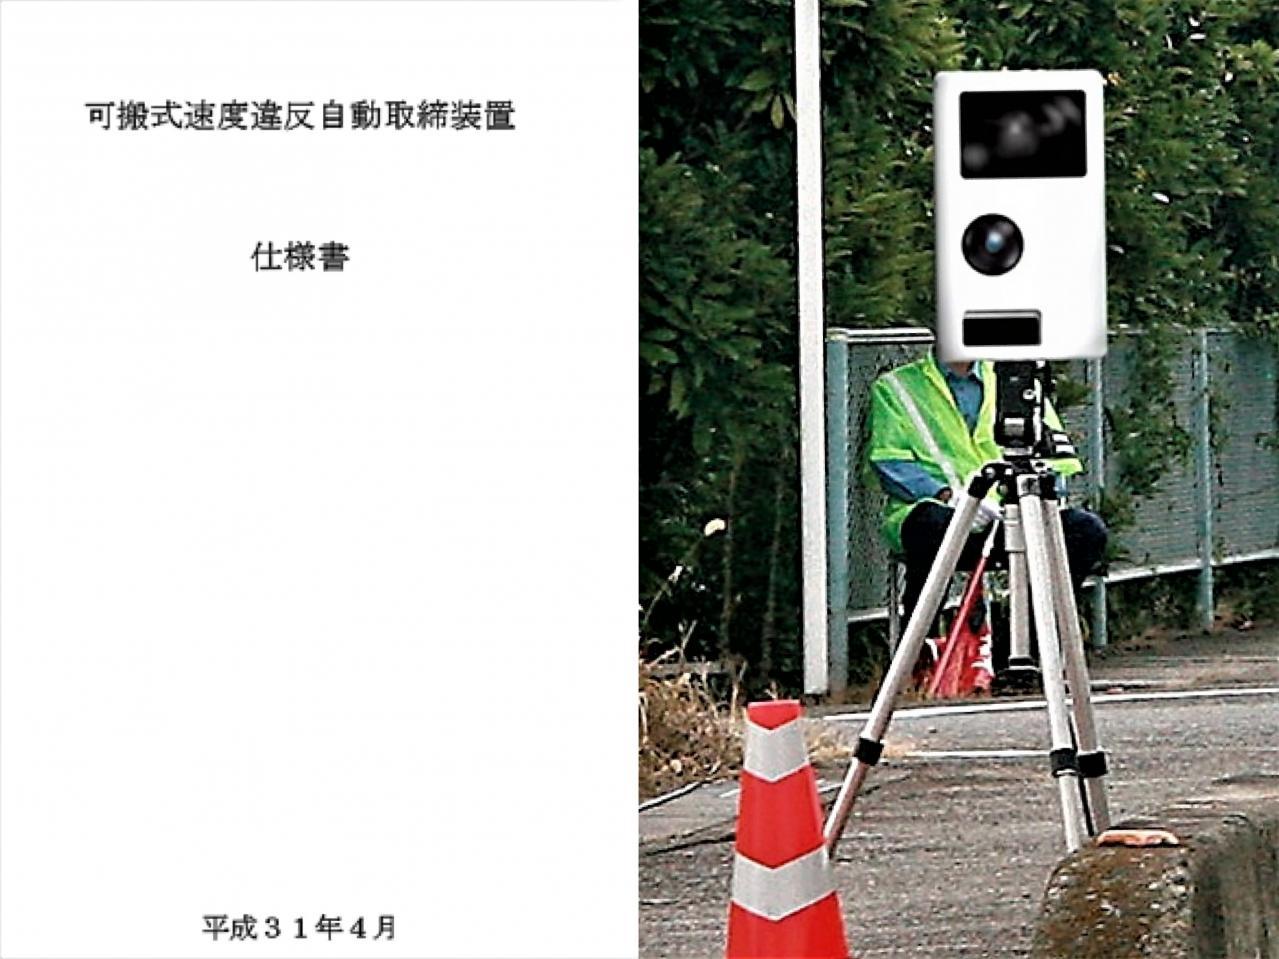 SCOOP!! レーザー式移動オービス、LSM-300の仕様書をゲット! やはり「その場でも検挙」、「2輪車も取締可能」という噂は、本当だった!